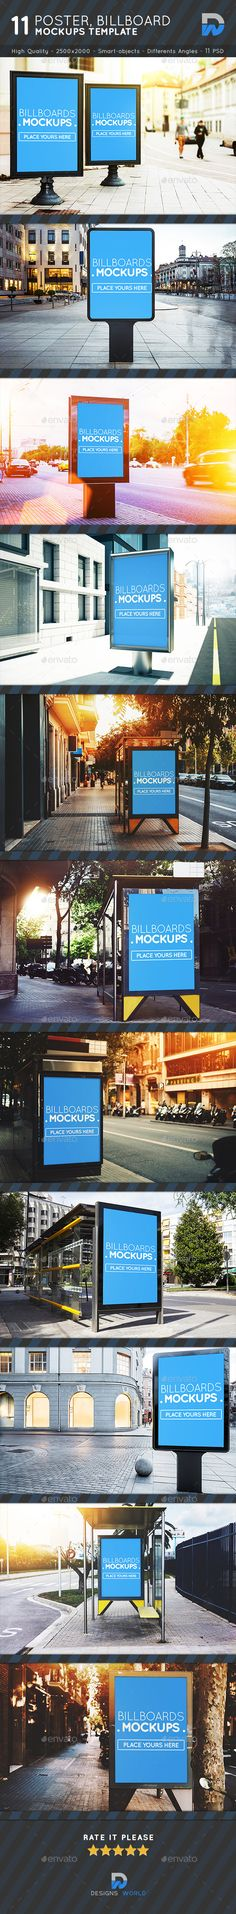 Posters, Billboards #Mock-ups Vol.6 - Posters Print Download here: https://graphicriver.net/item/posters-billboards-mockups-vol6/19584545?ref=alena994